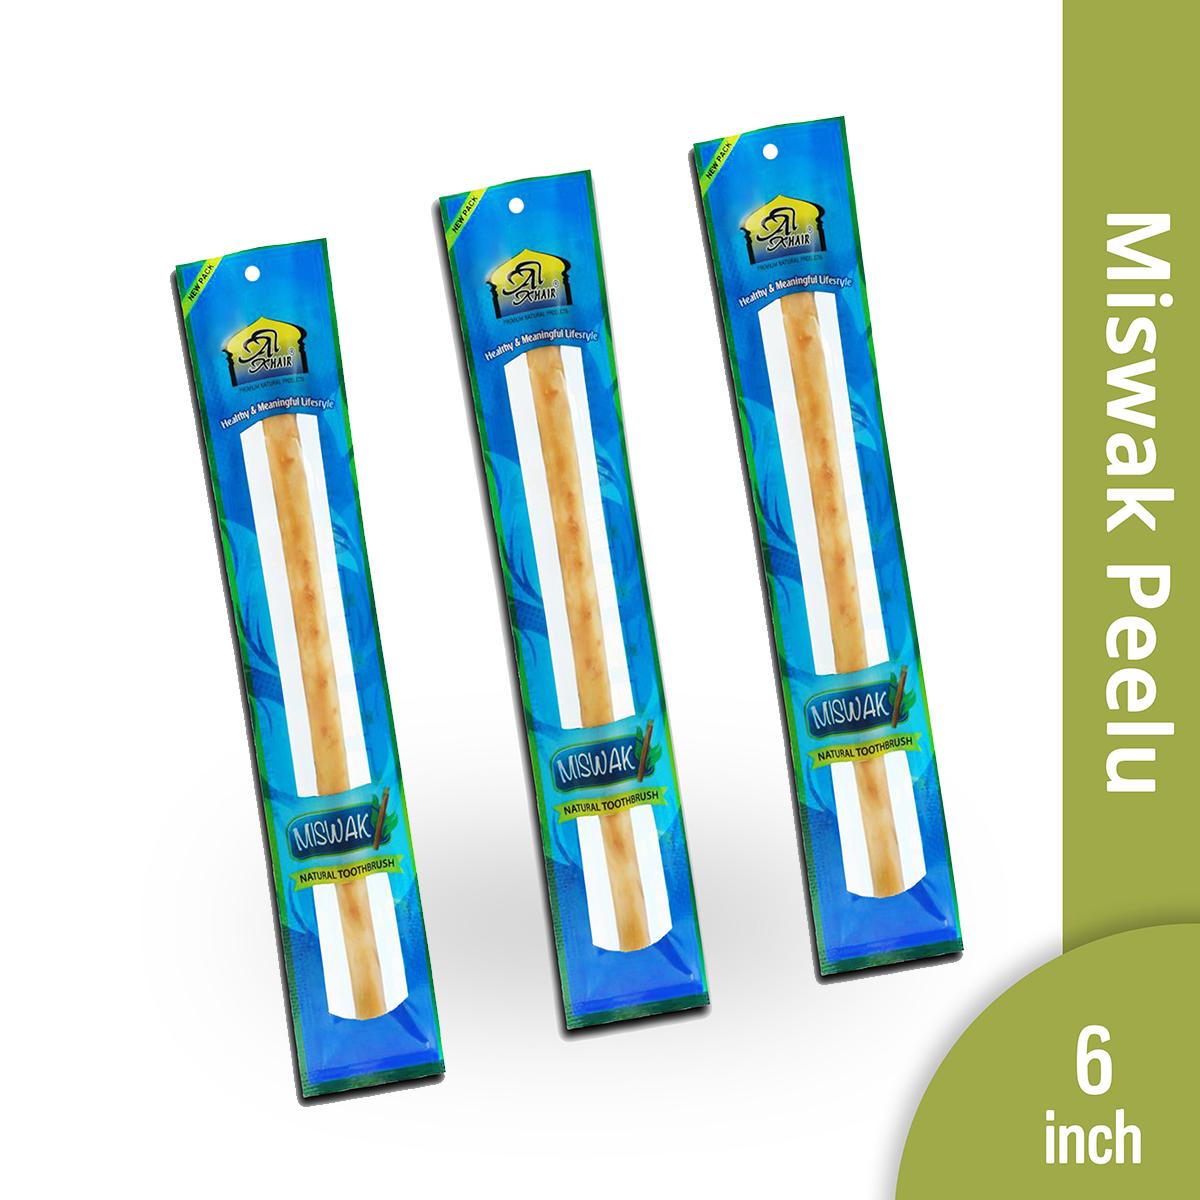 Peelu Miswak - 5 pcs bundle | Export Quality | 6' Inch | Thin |  Natural Toothbrush | Vacuum Packed |